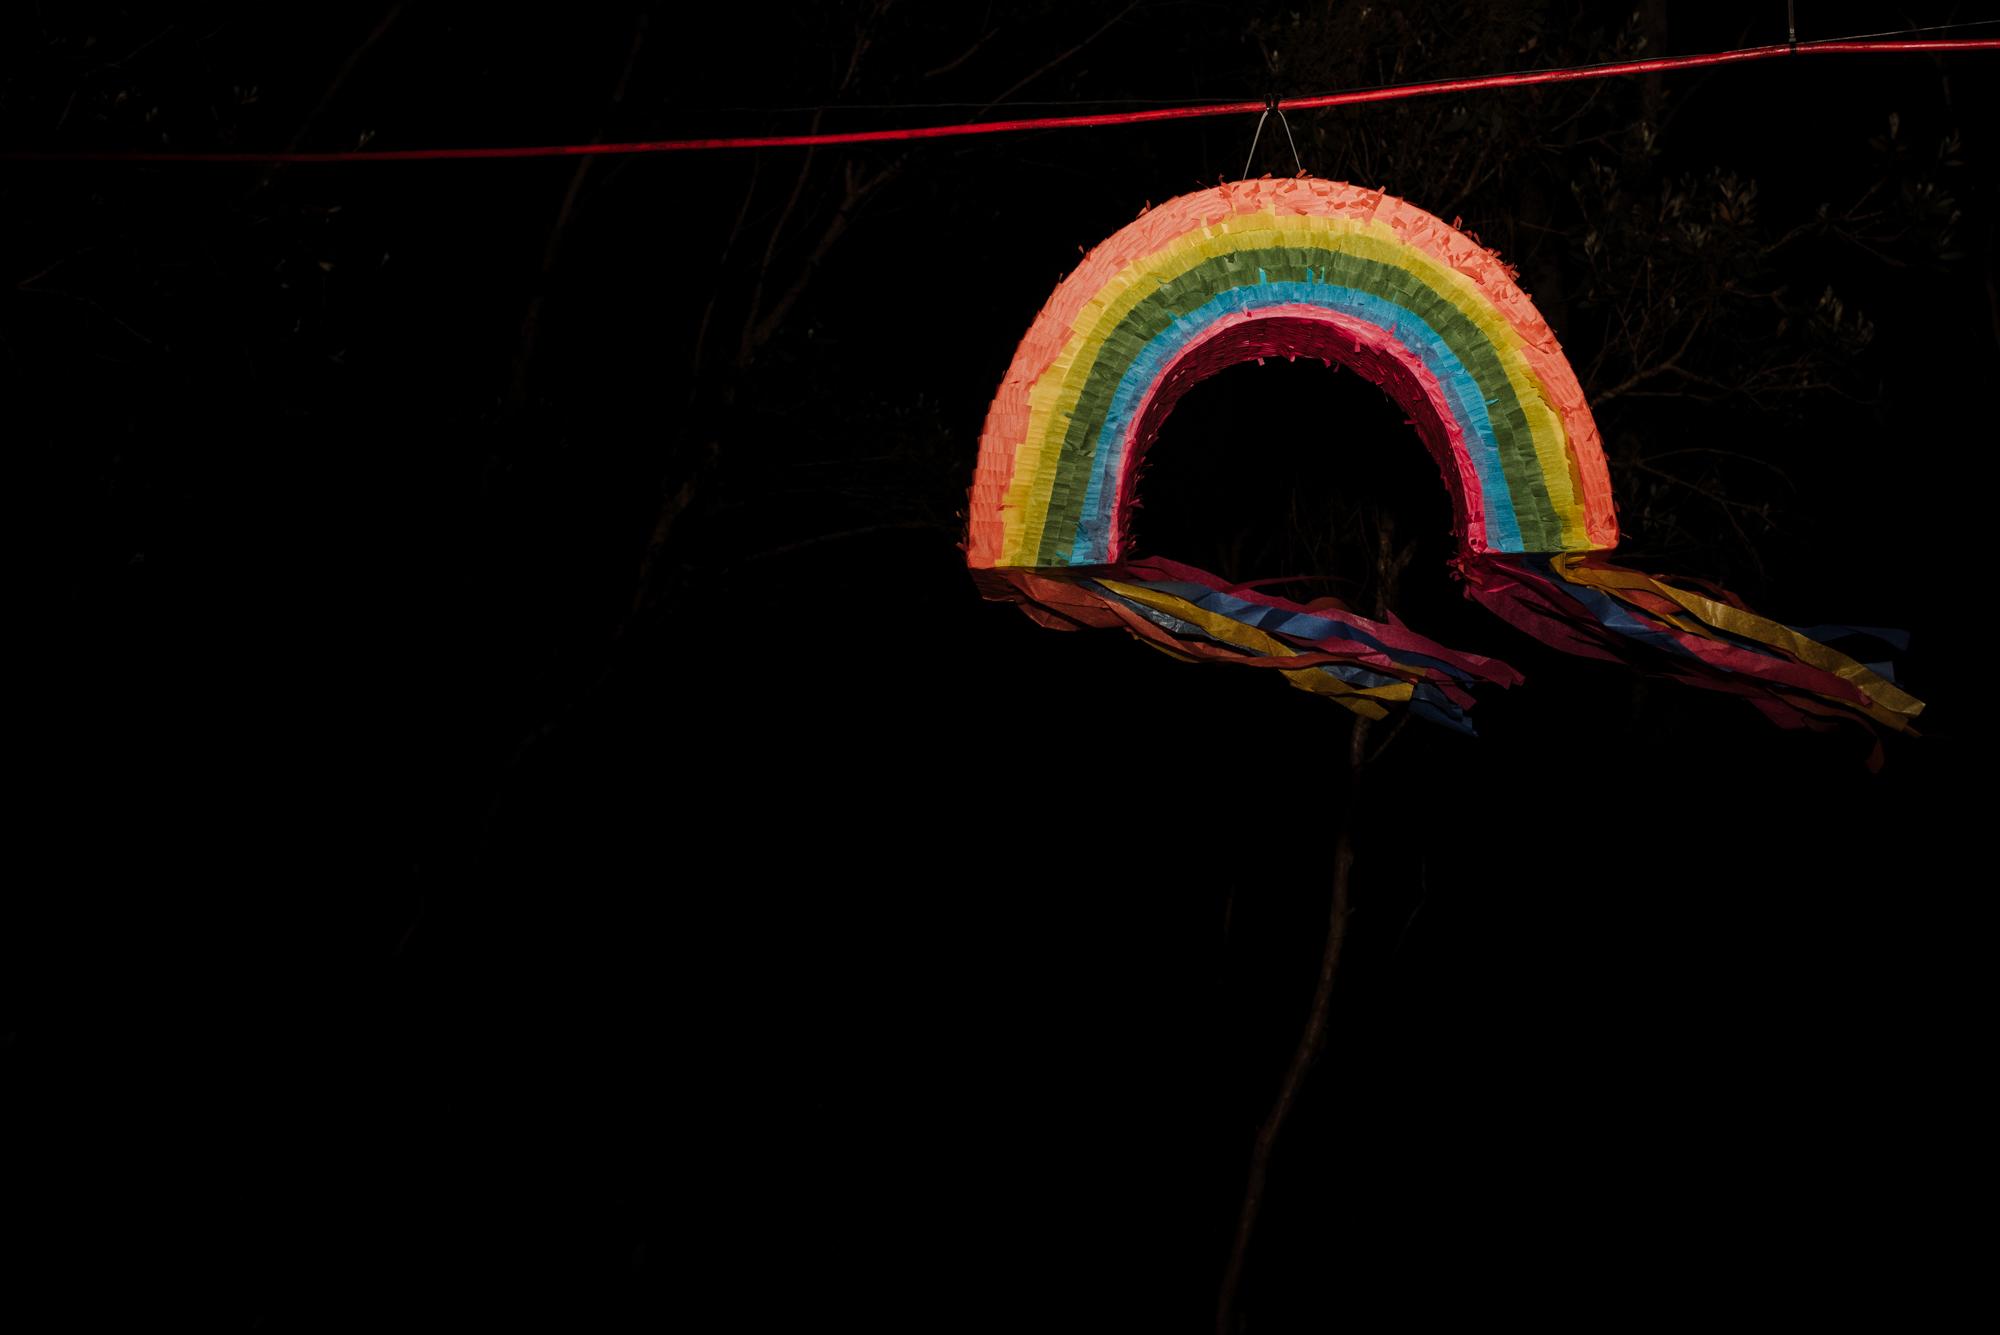 jessica-howard-photography-sean-alessandro-wedding-day-web-460.jpg